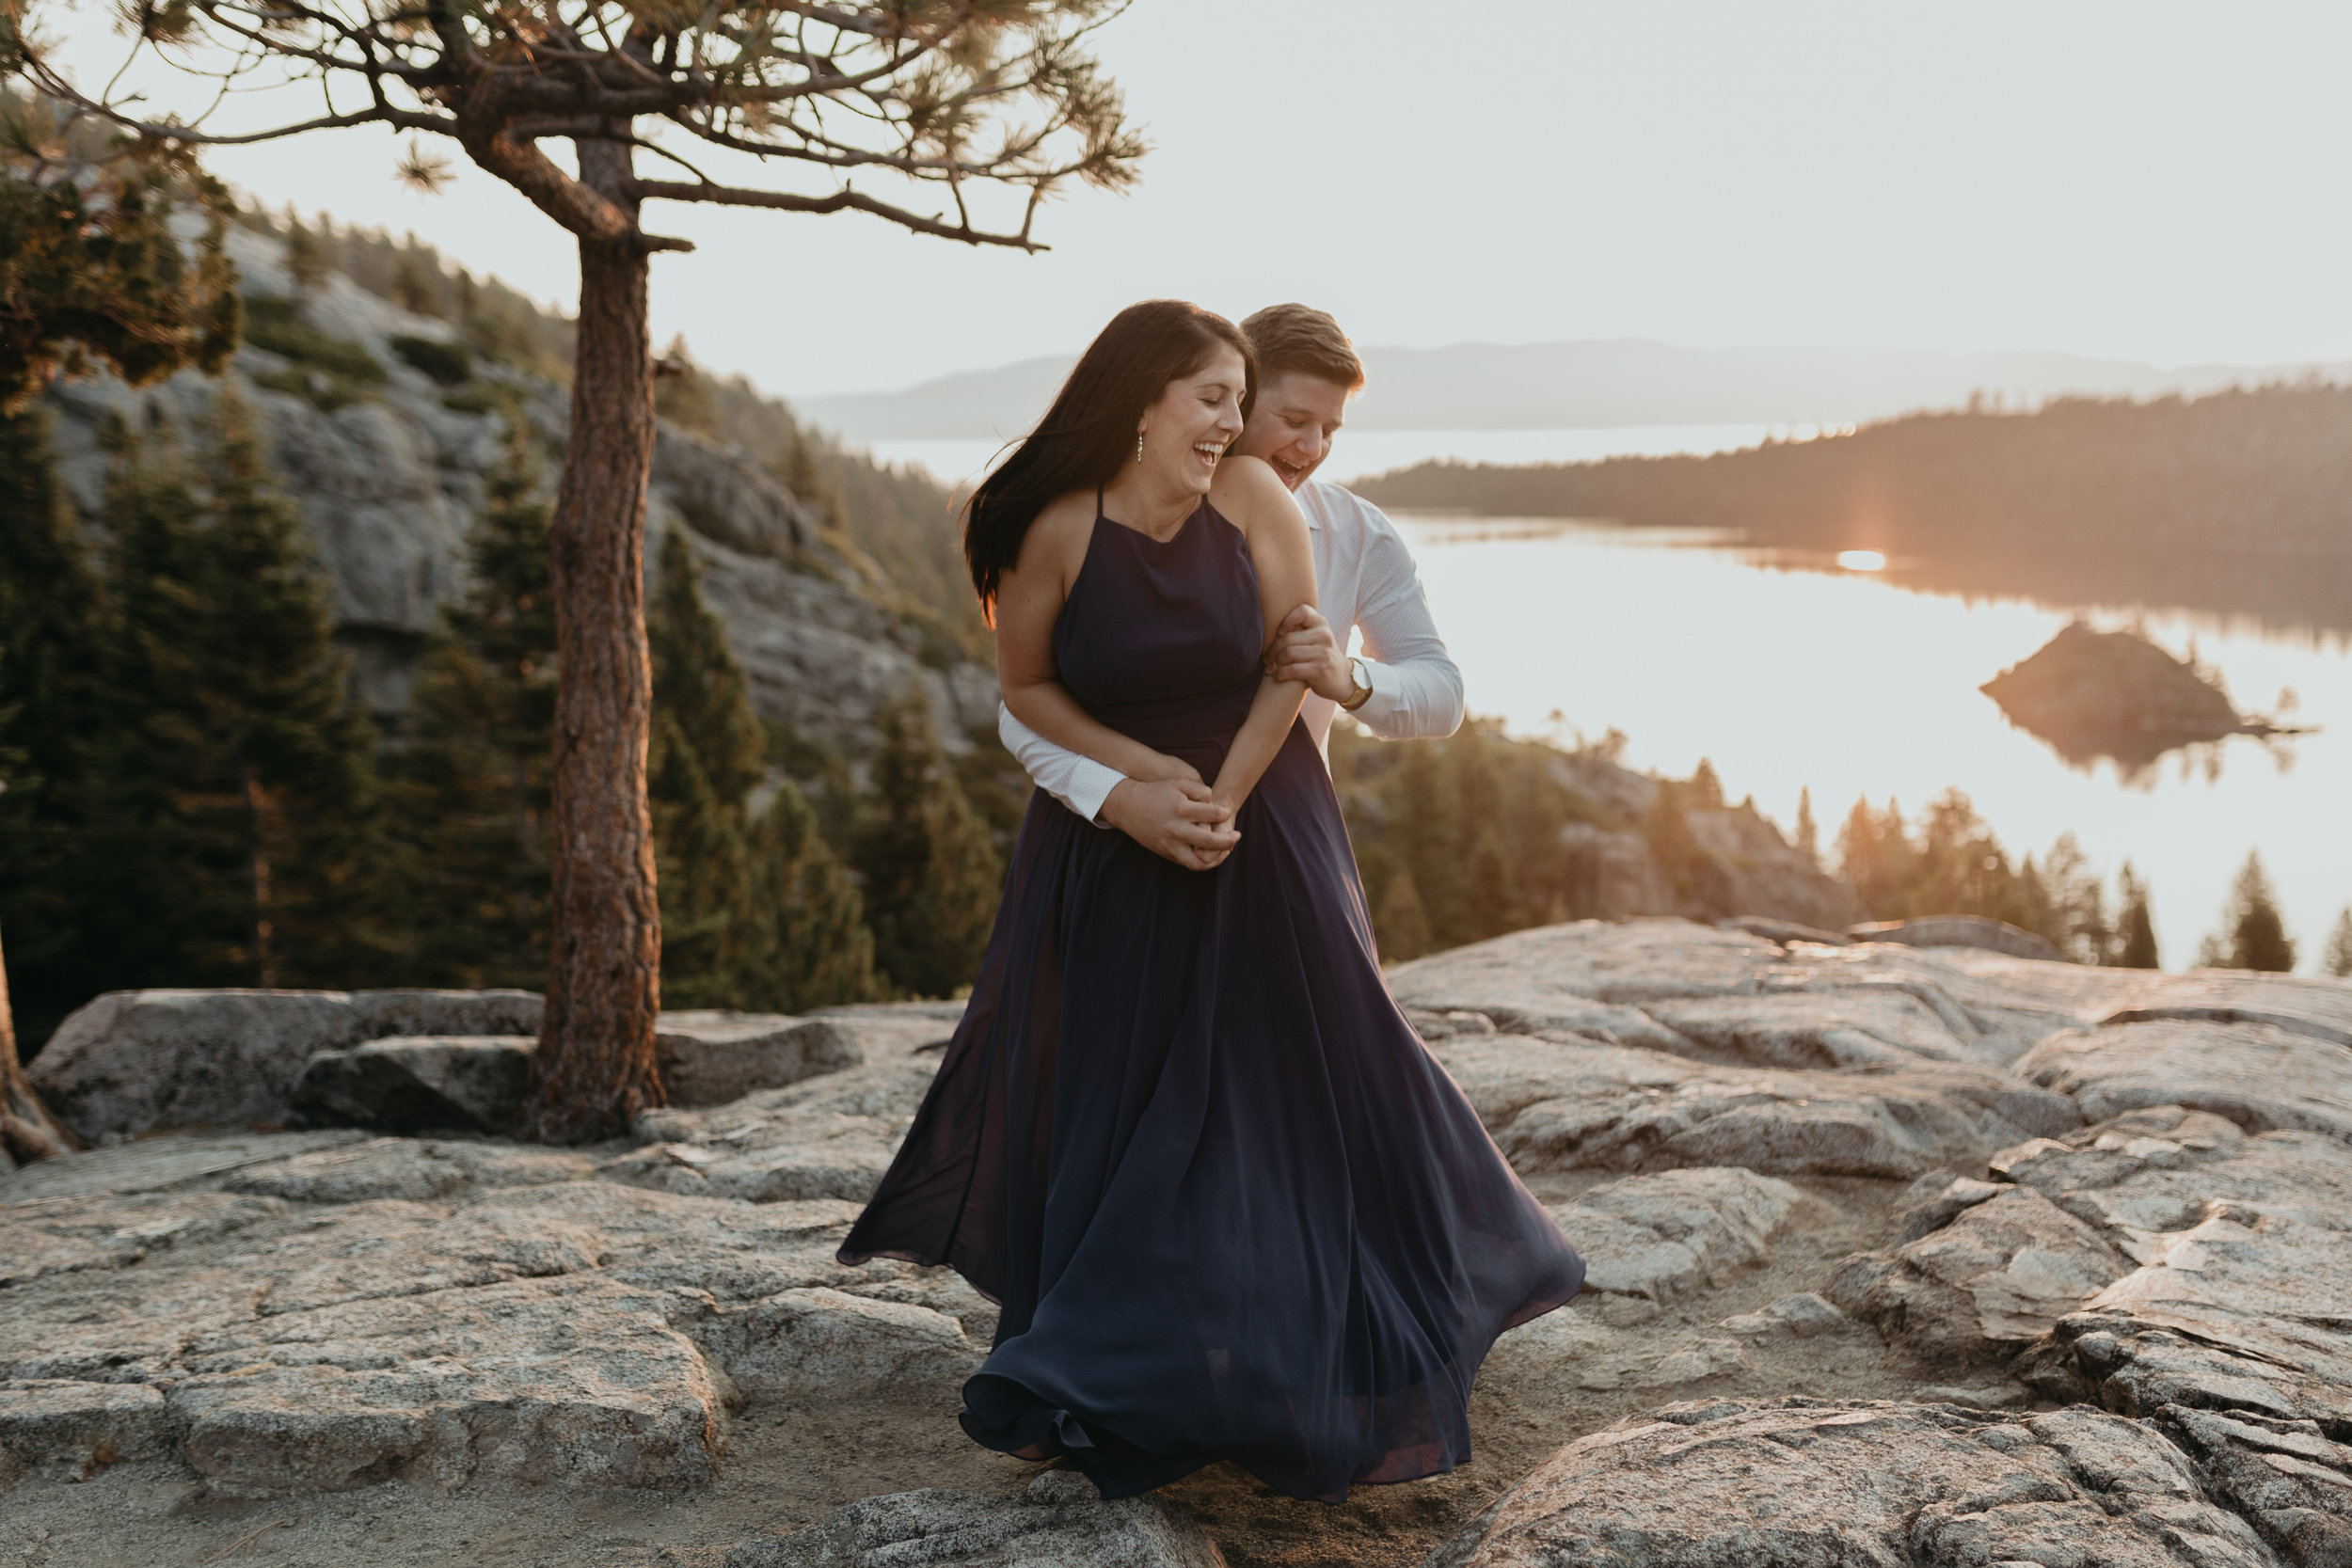 nicole-daacke-photography-lake-tahoe-sunrise-summer-adventure-engagement-photos-nevada-wedding-elopement-photographer-golden-emerald-bay-light-pine-trees-summer-vibe-fun-carefree-authentic-love-21.jpg